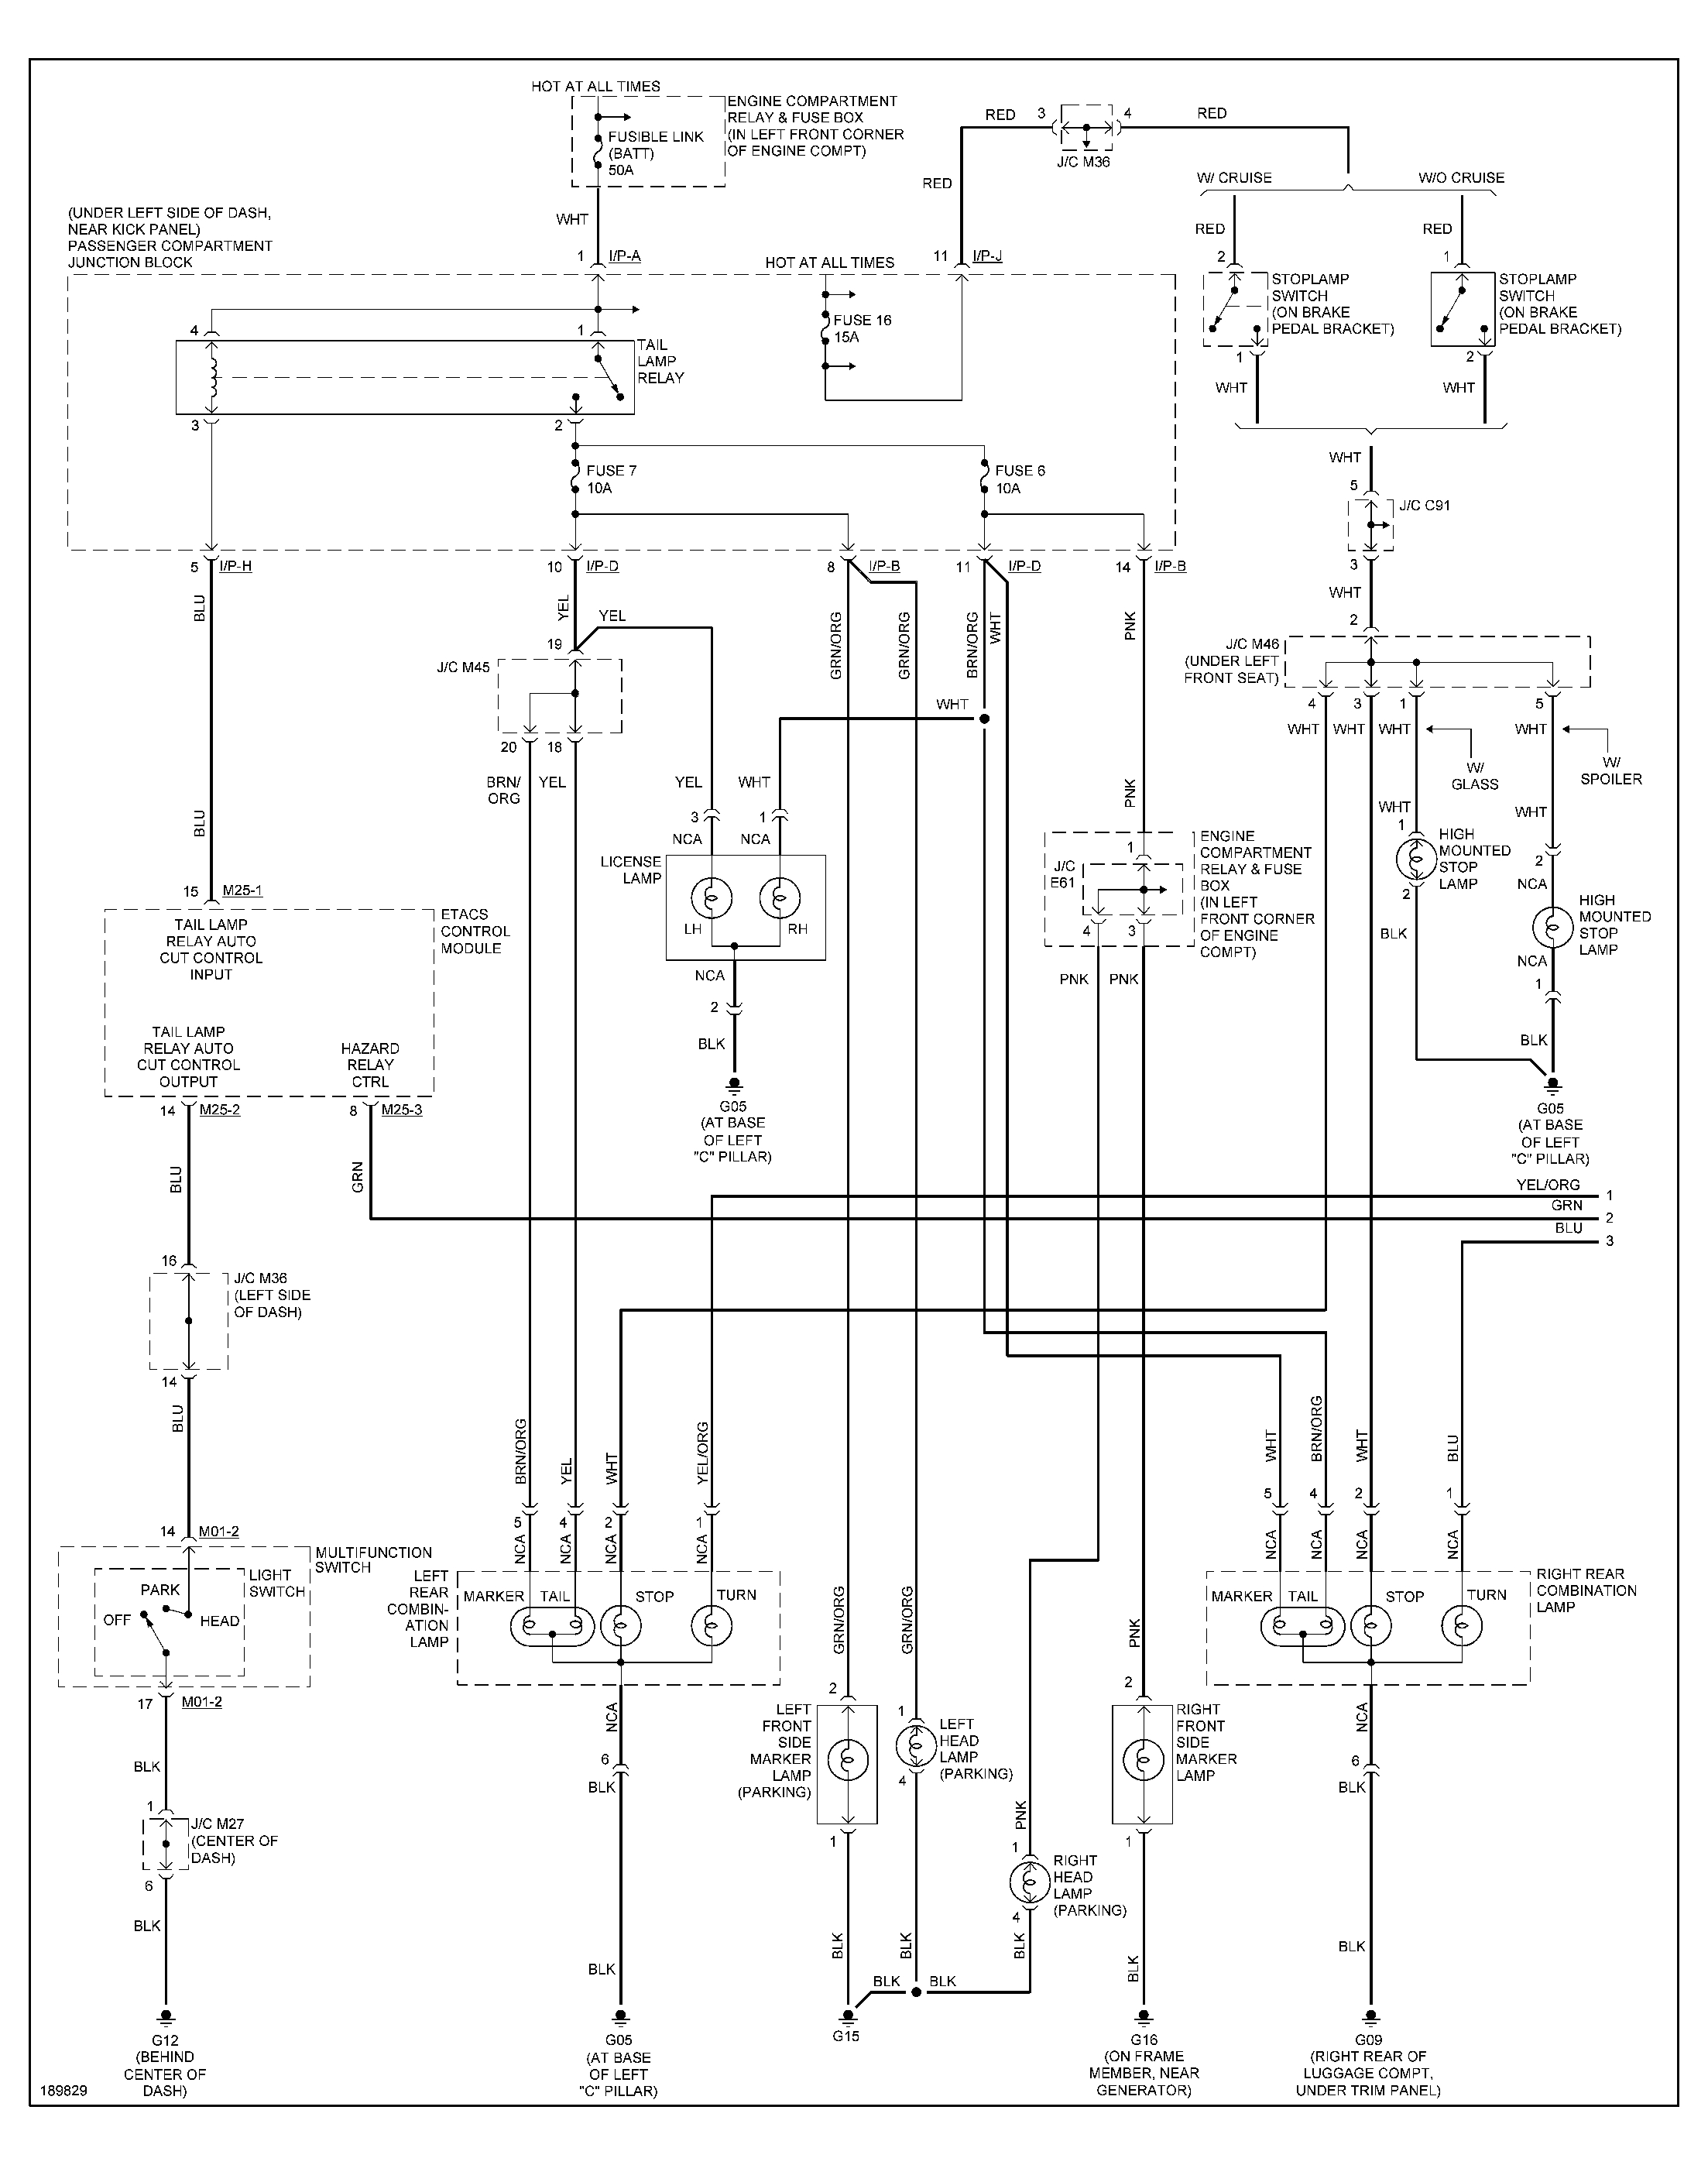 stereo wiring diagram hyundai accent 2000 wiring diagram used wire diagram 04 hyundai santa fe ets